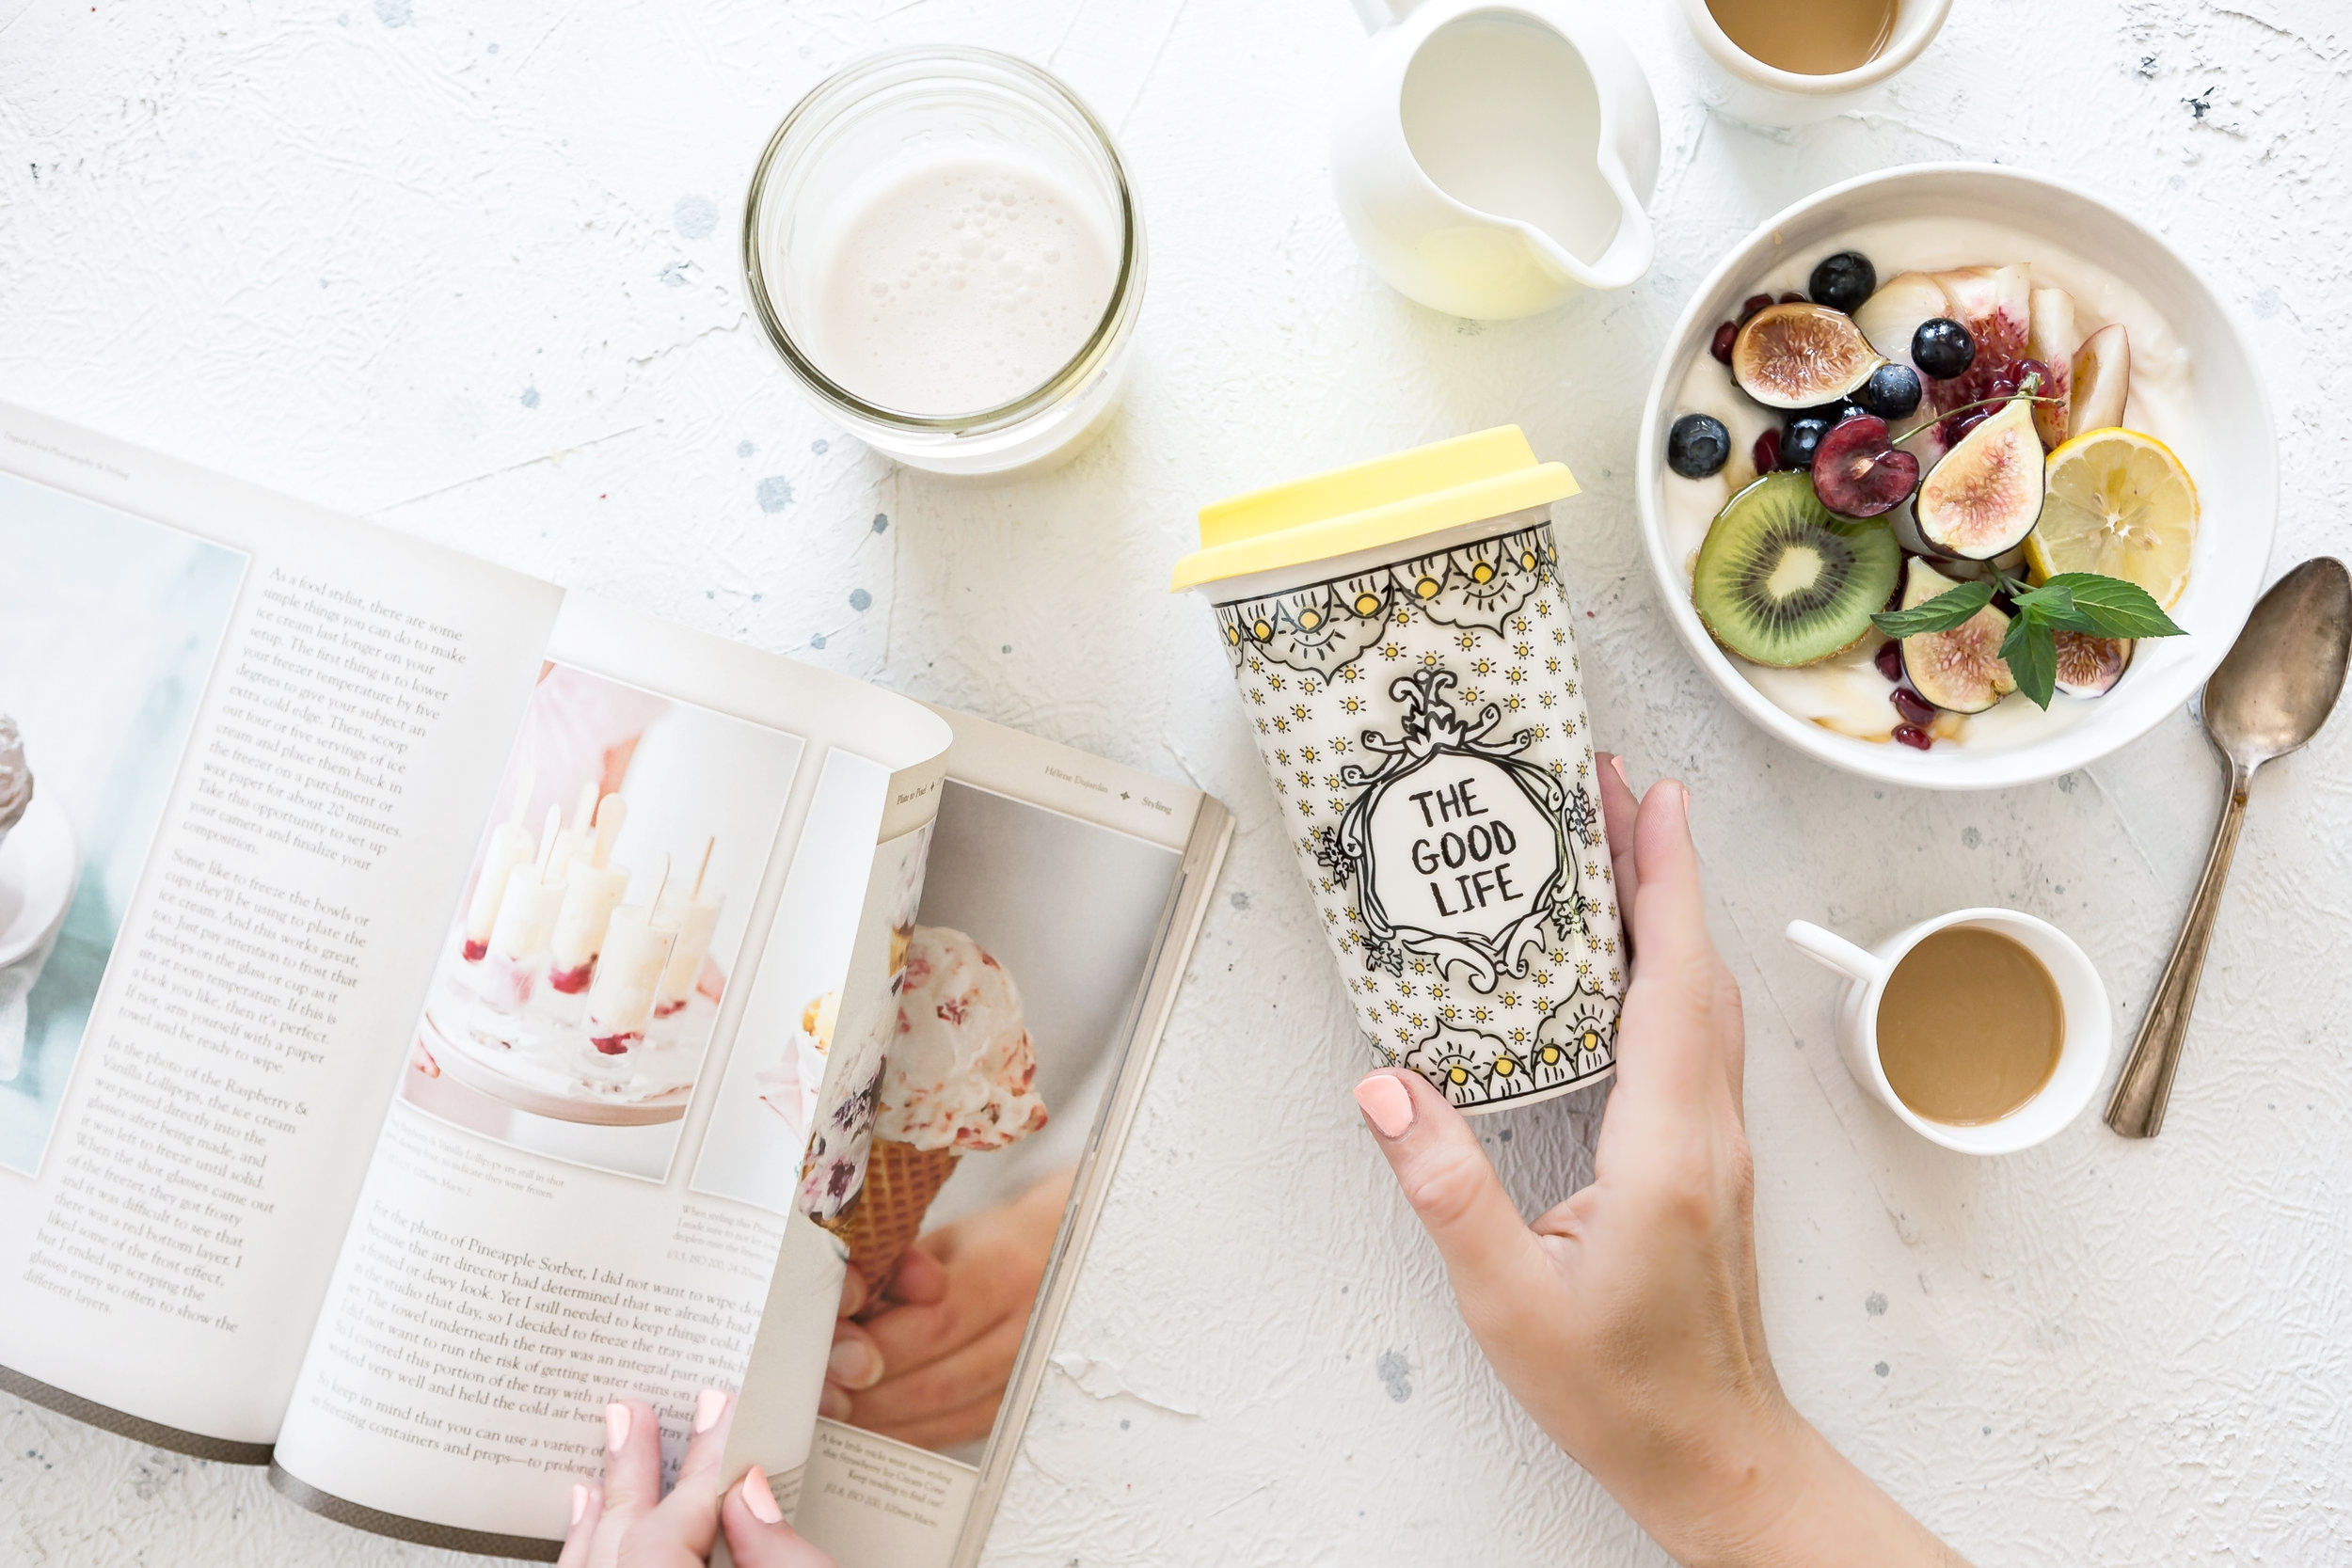 2017-08-05 VIRTUE Perfect Paleo Coconut Milk Creamer 2.jpg